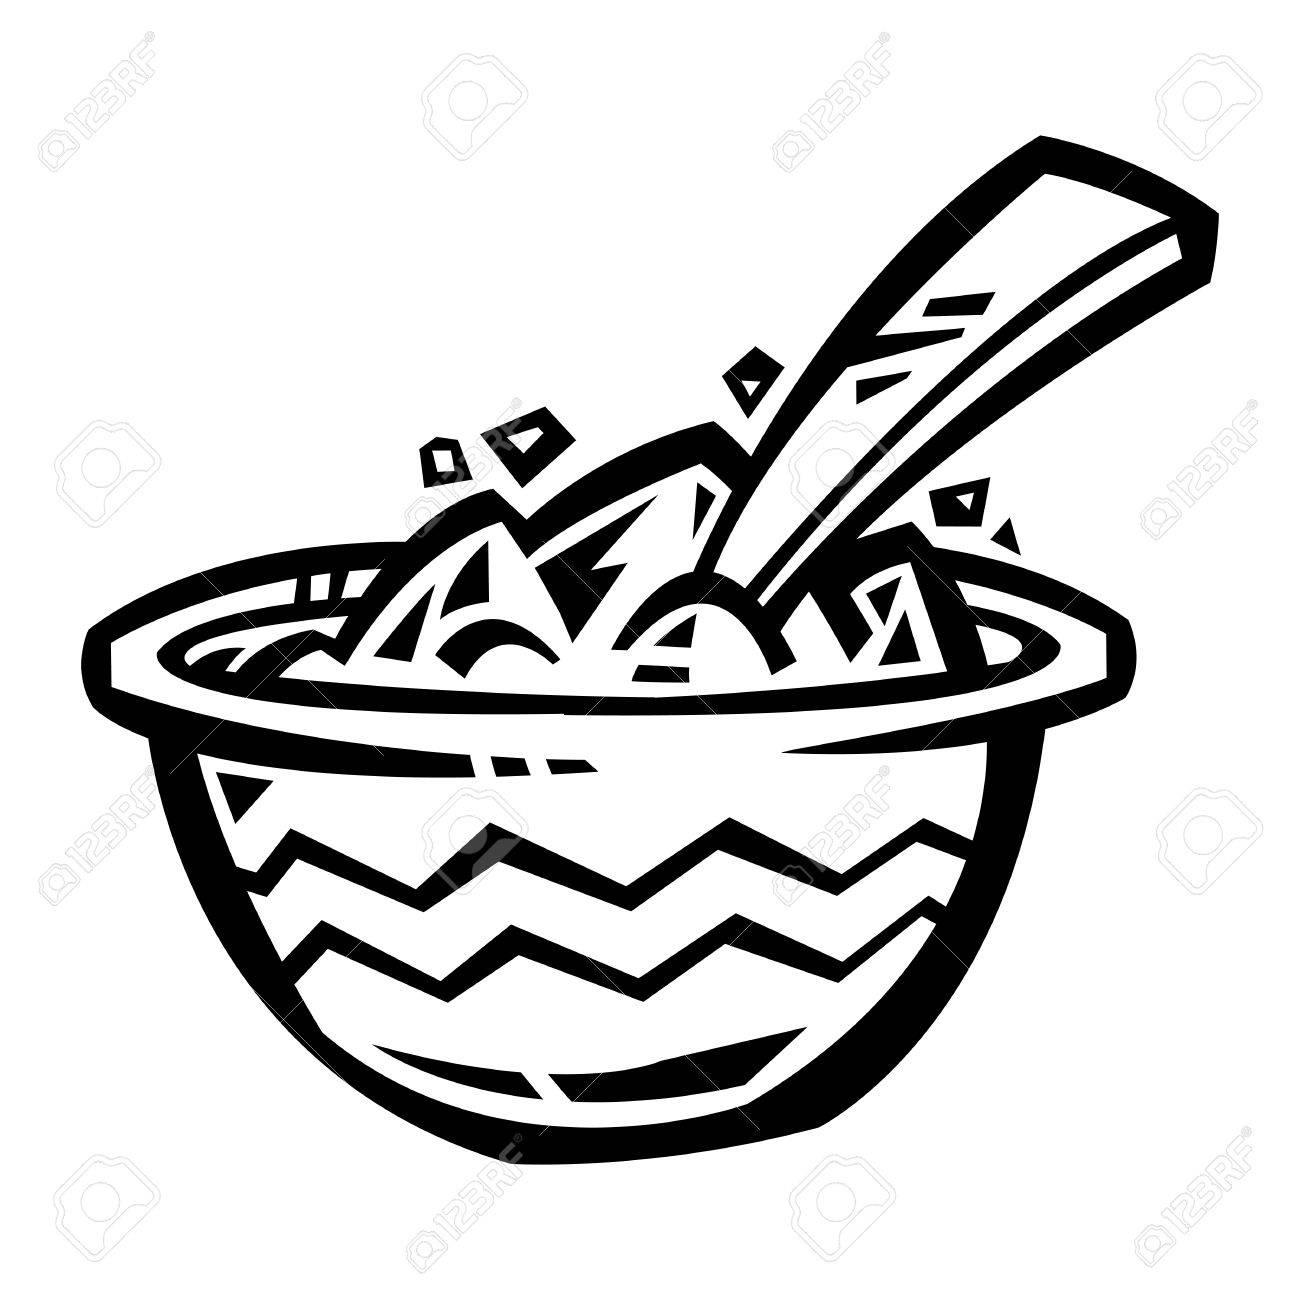 hight resolution of block diagram hpcljmfpcm8050cm8060 wiring diagram today black and white cartoon bowl of cereal stock vector art